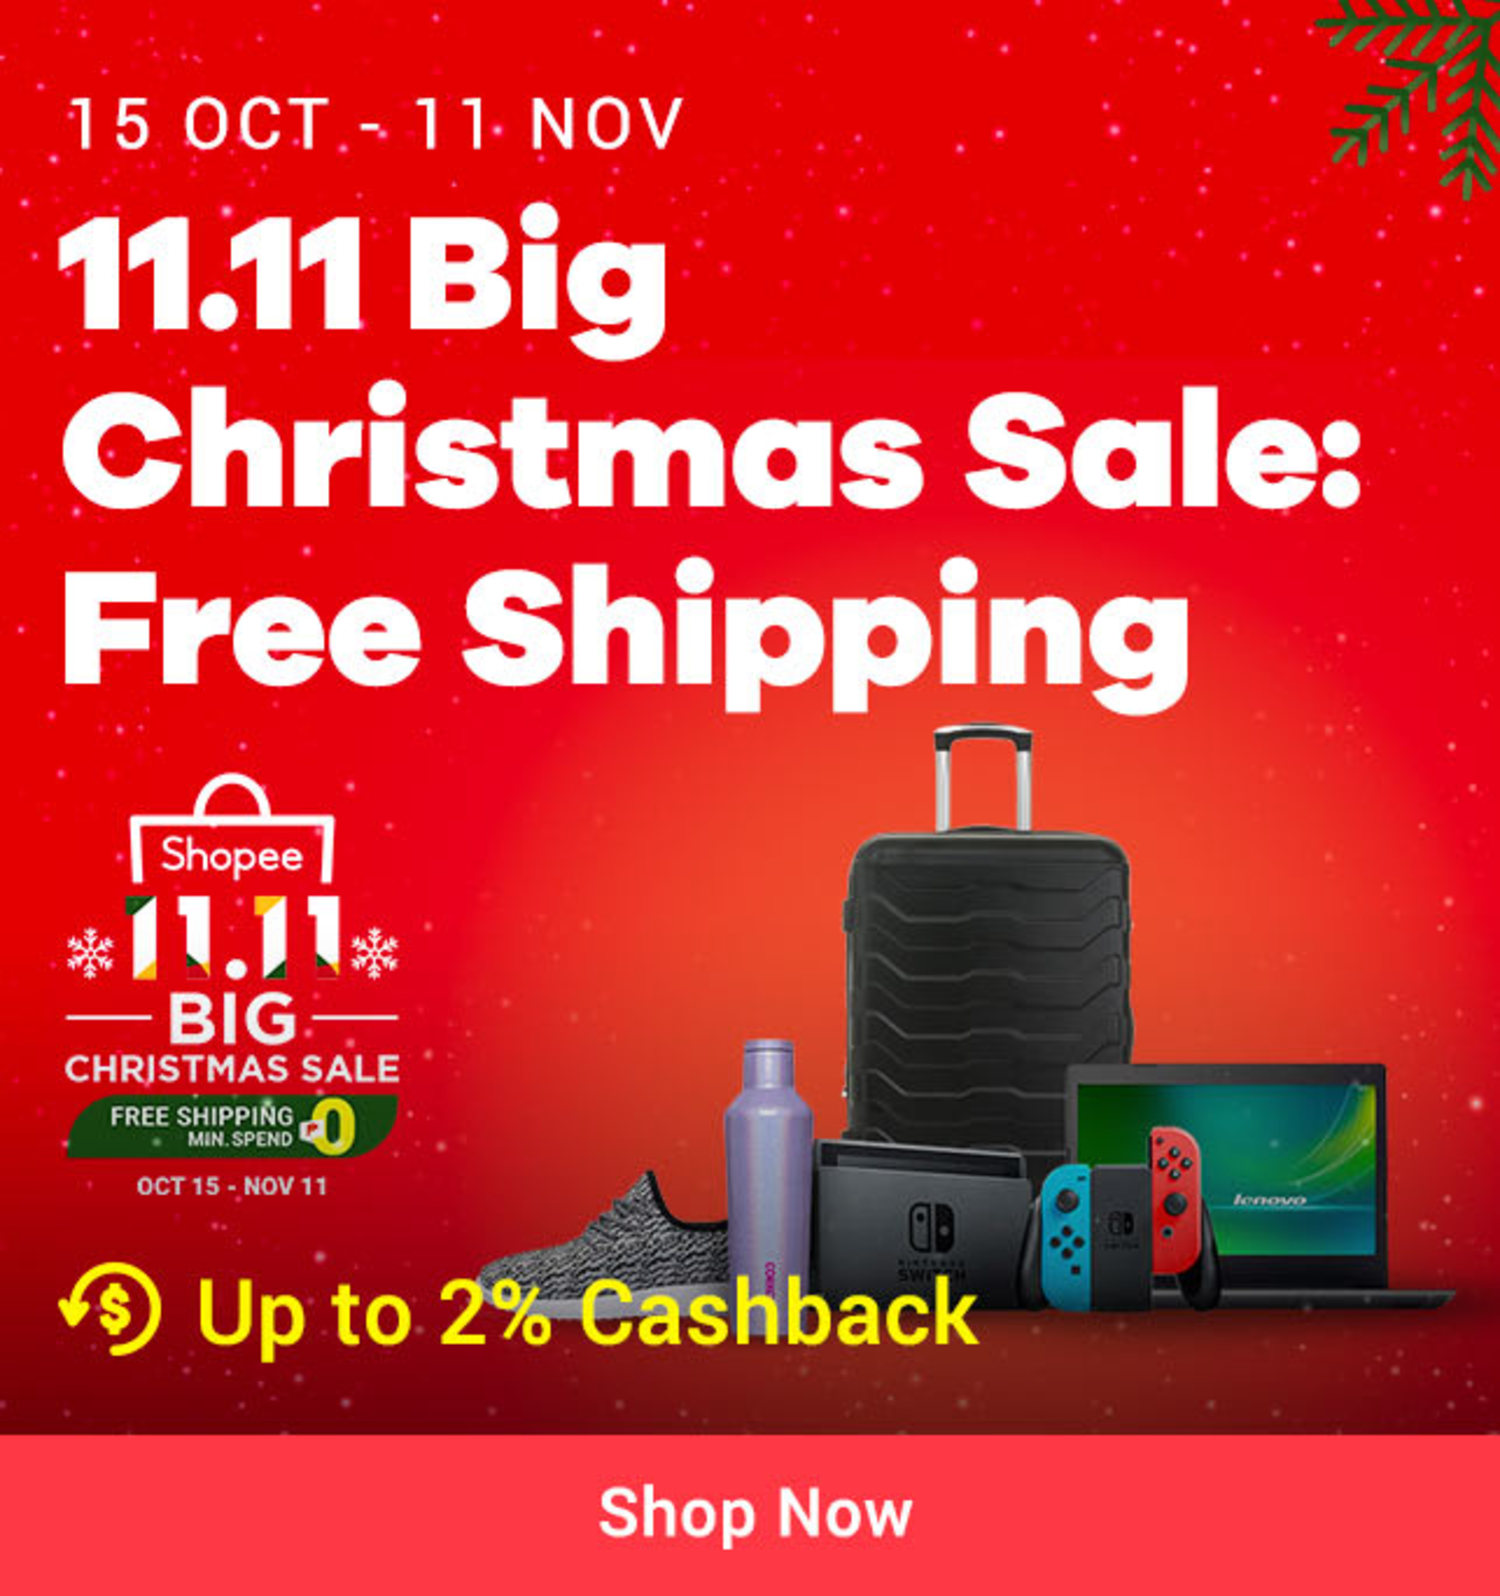 Shopee: 11.11 Big Christmas Sale + Free Shipping